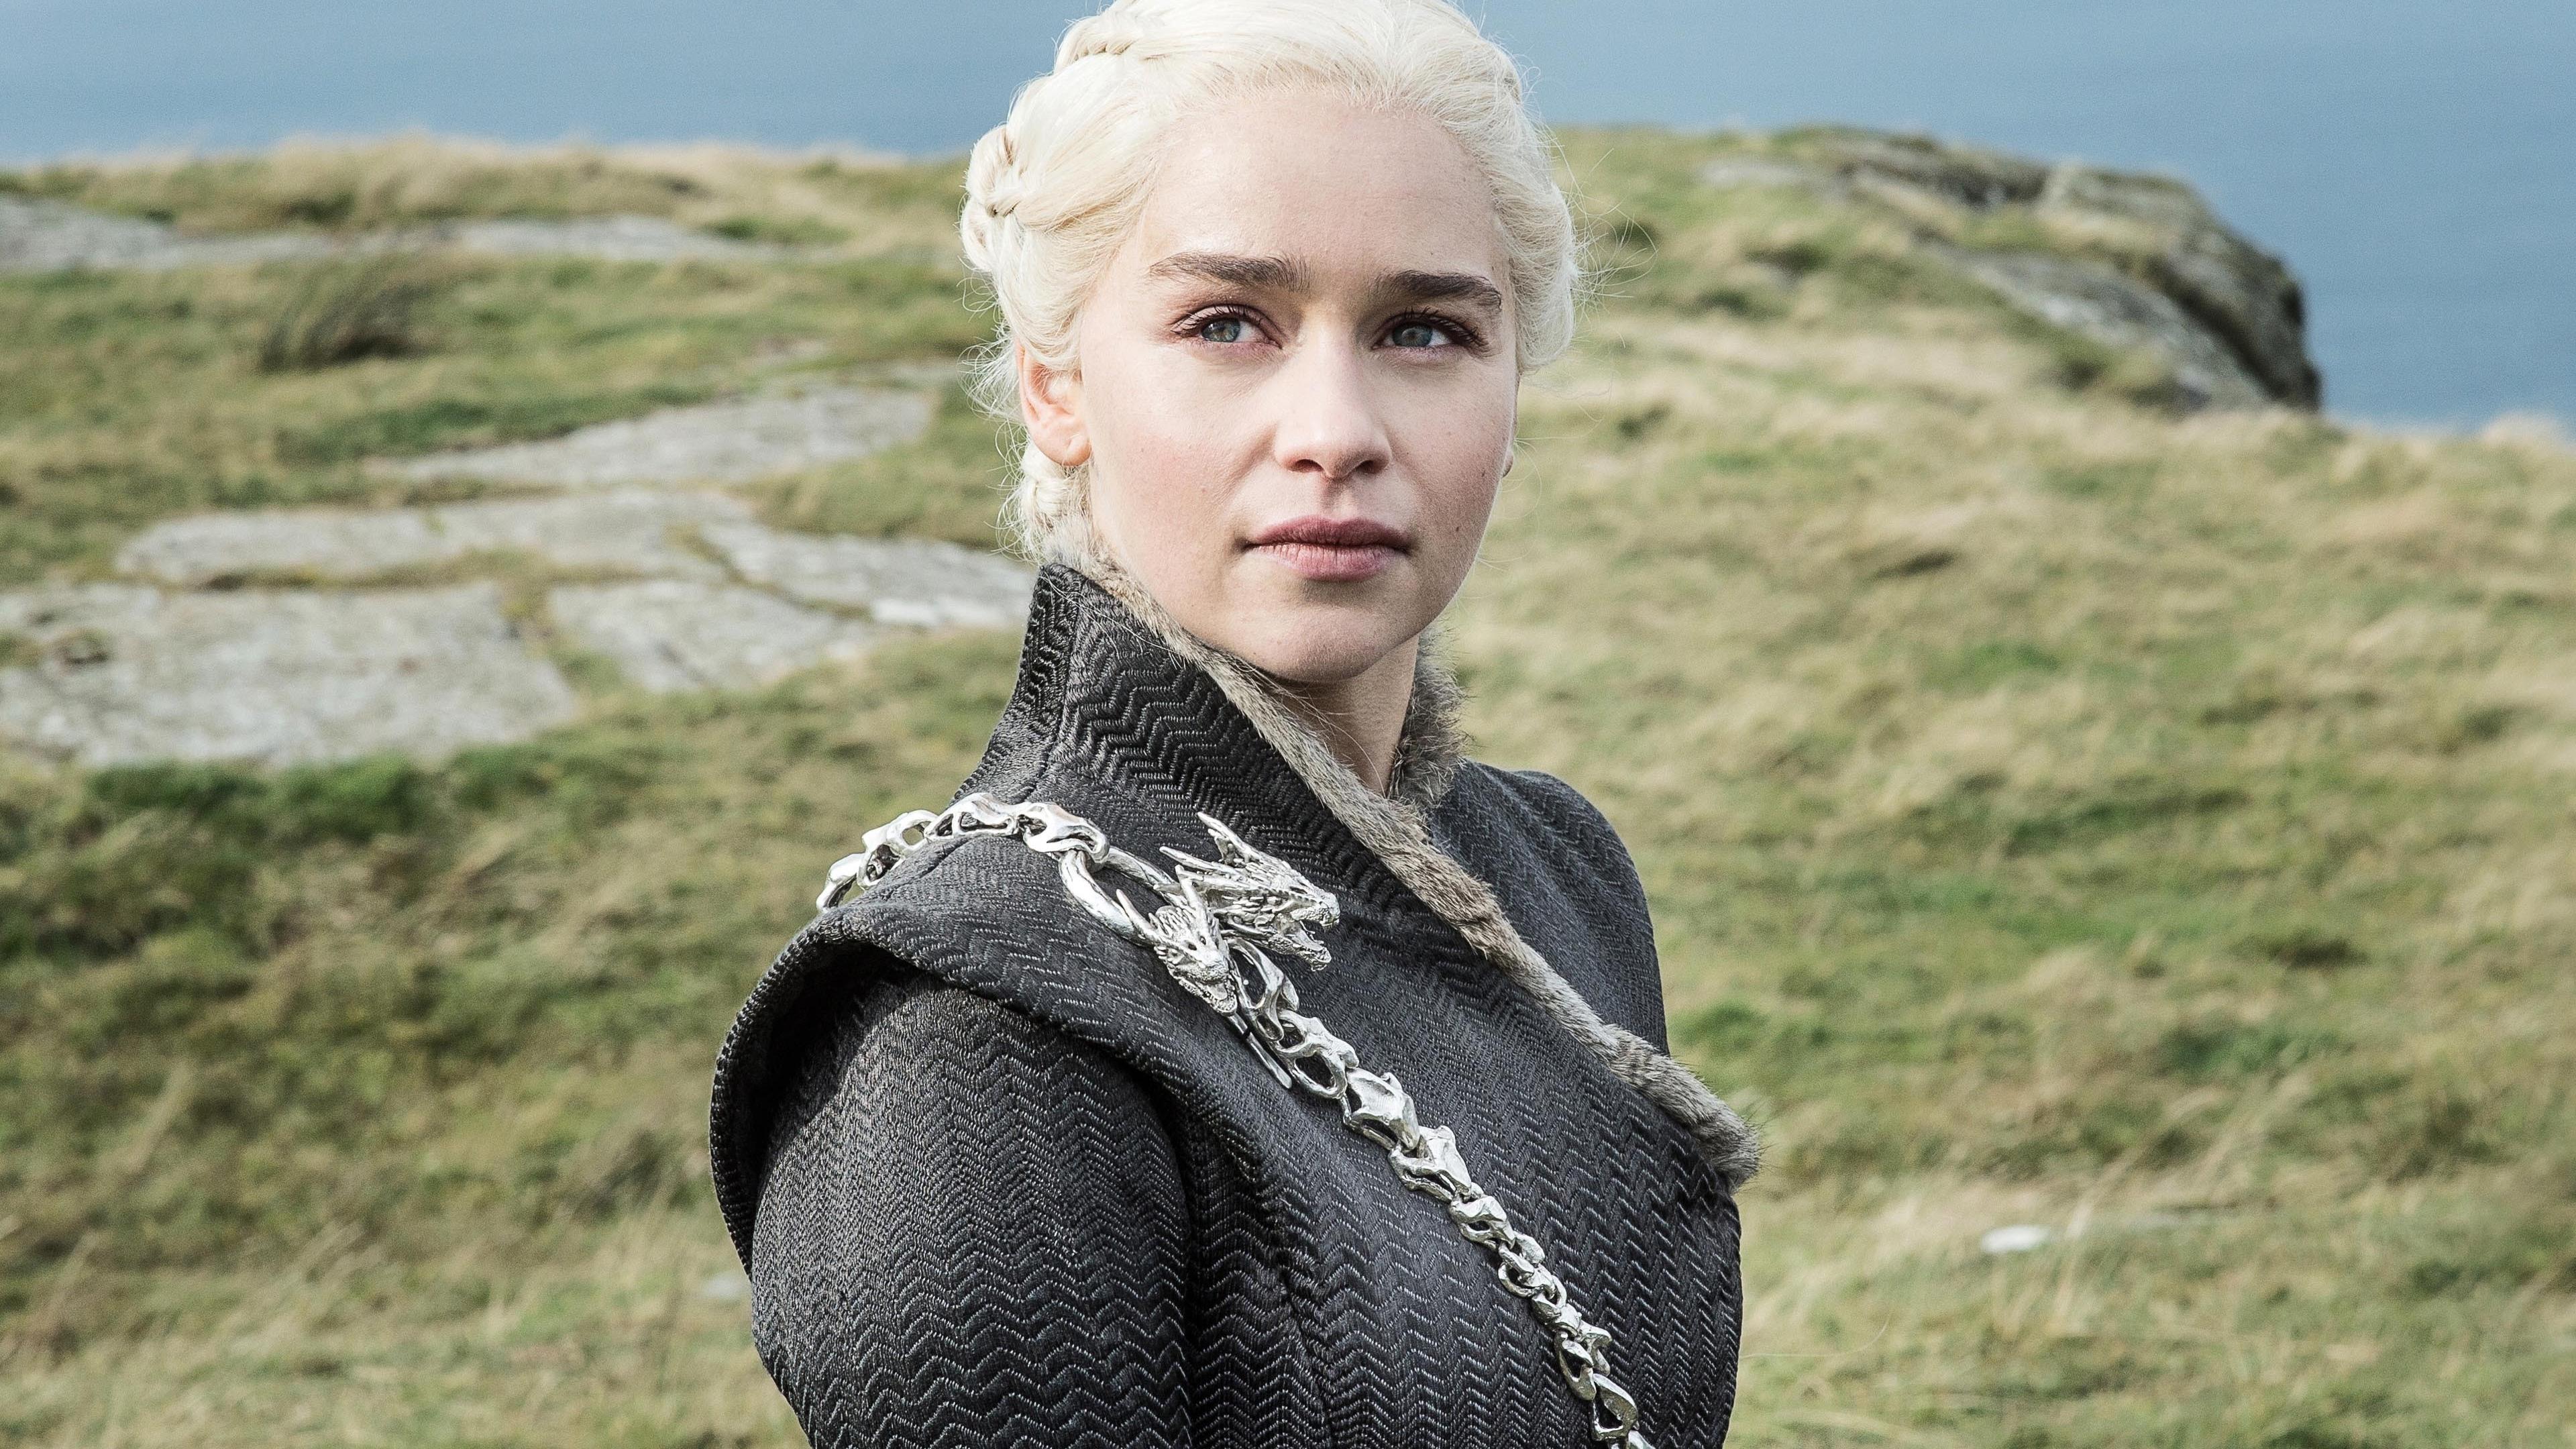 Download 3840x2160 Wallpaper Beautiful Daenerys Targaryen